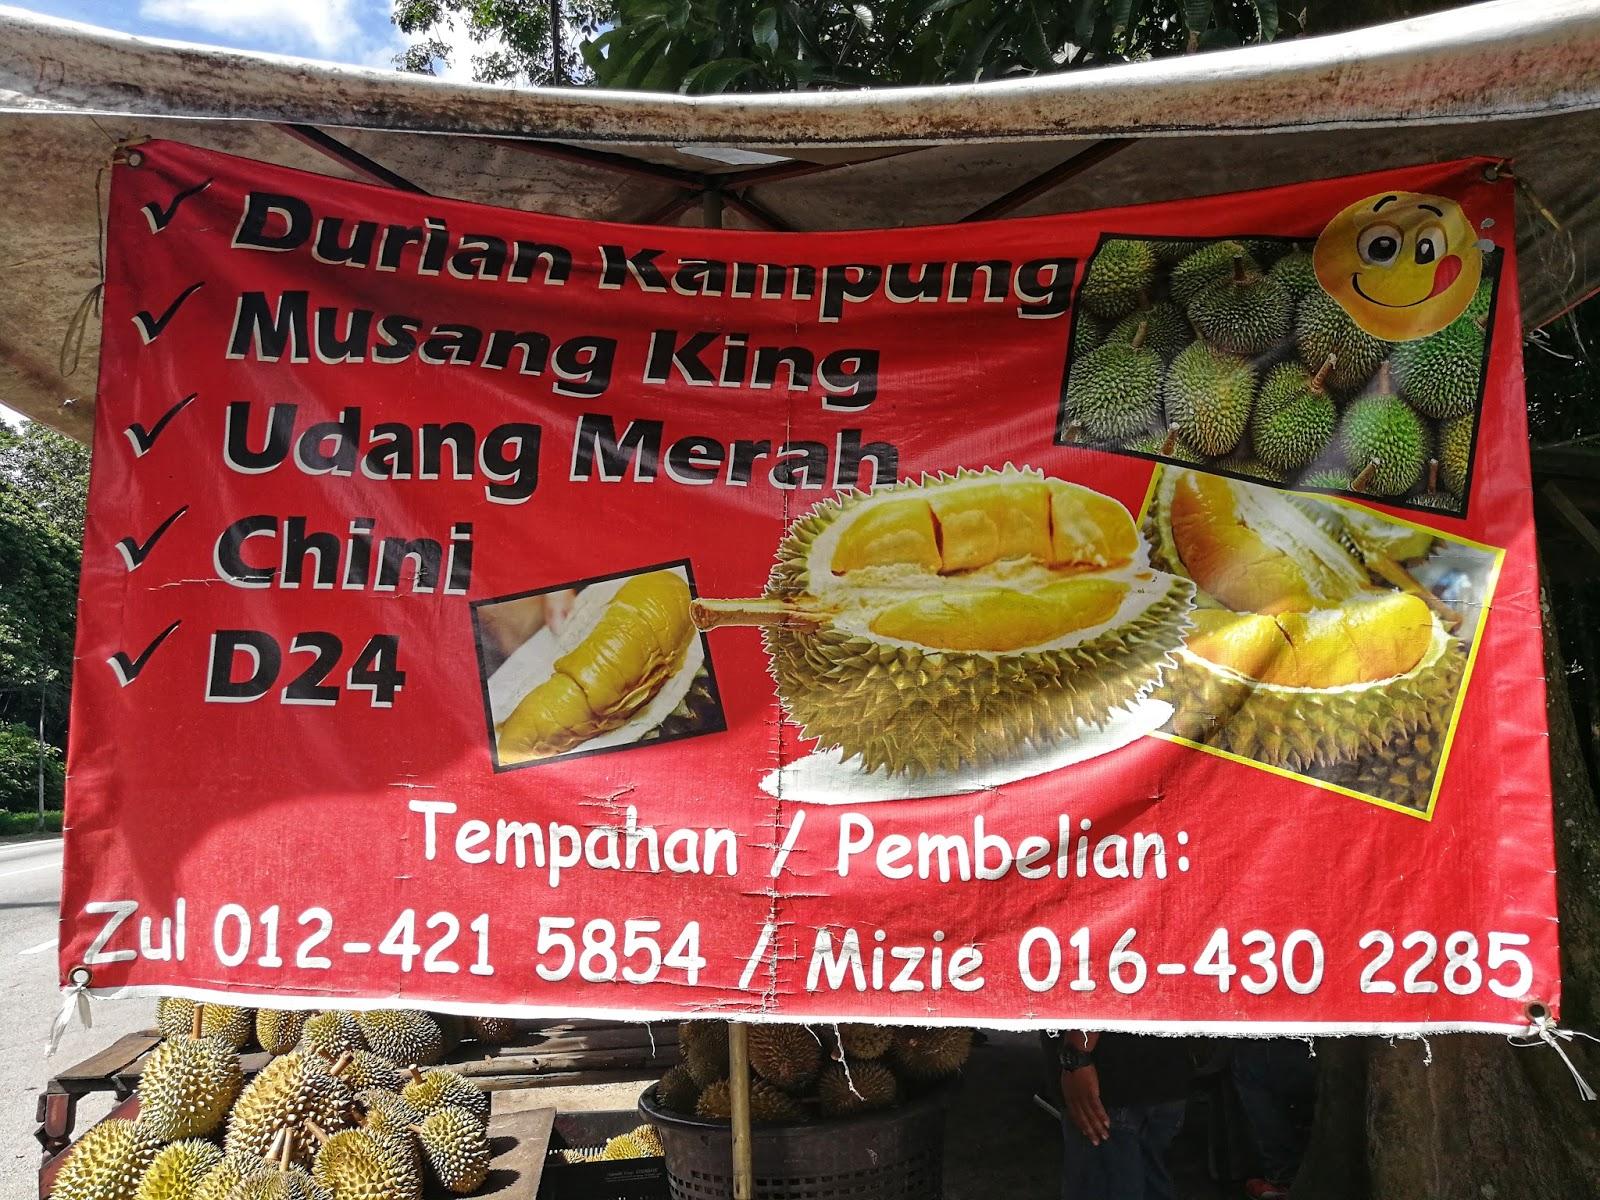 Tempahan durian